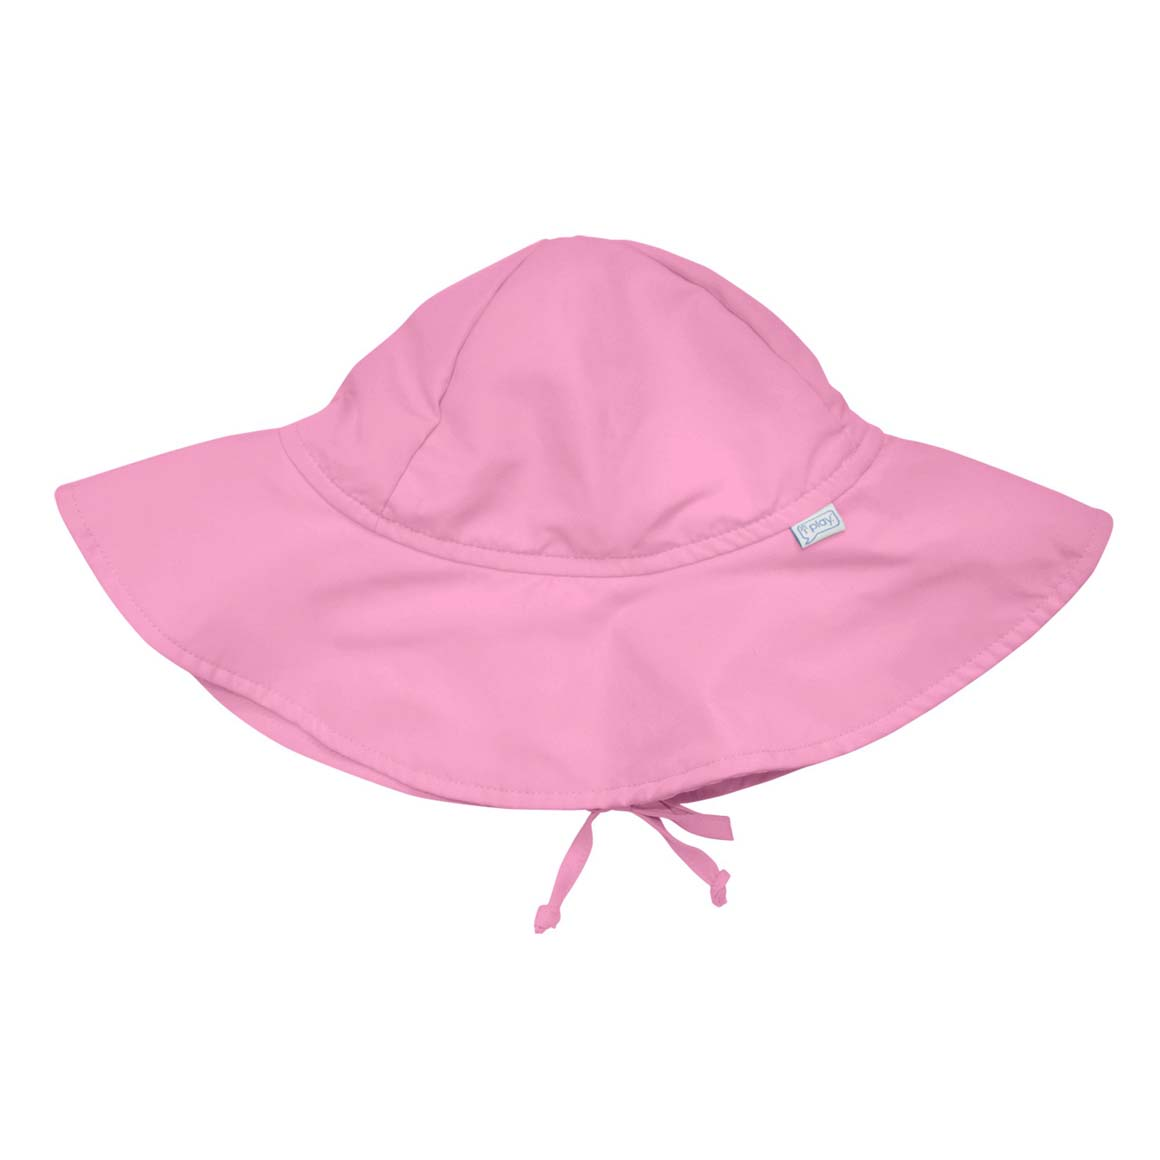 Brim Sun Protection Hat-Light Pink | Trada Marketplace